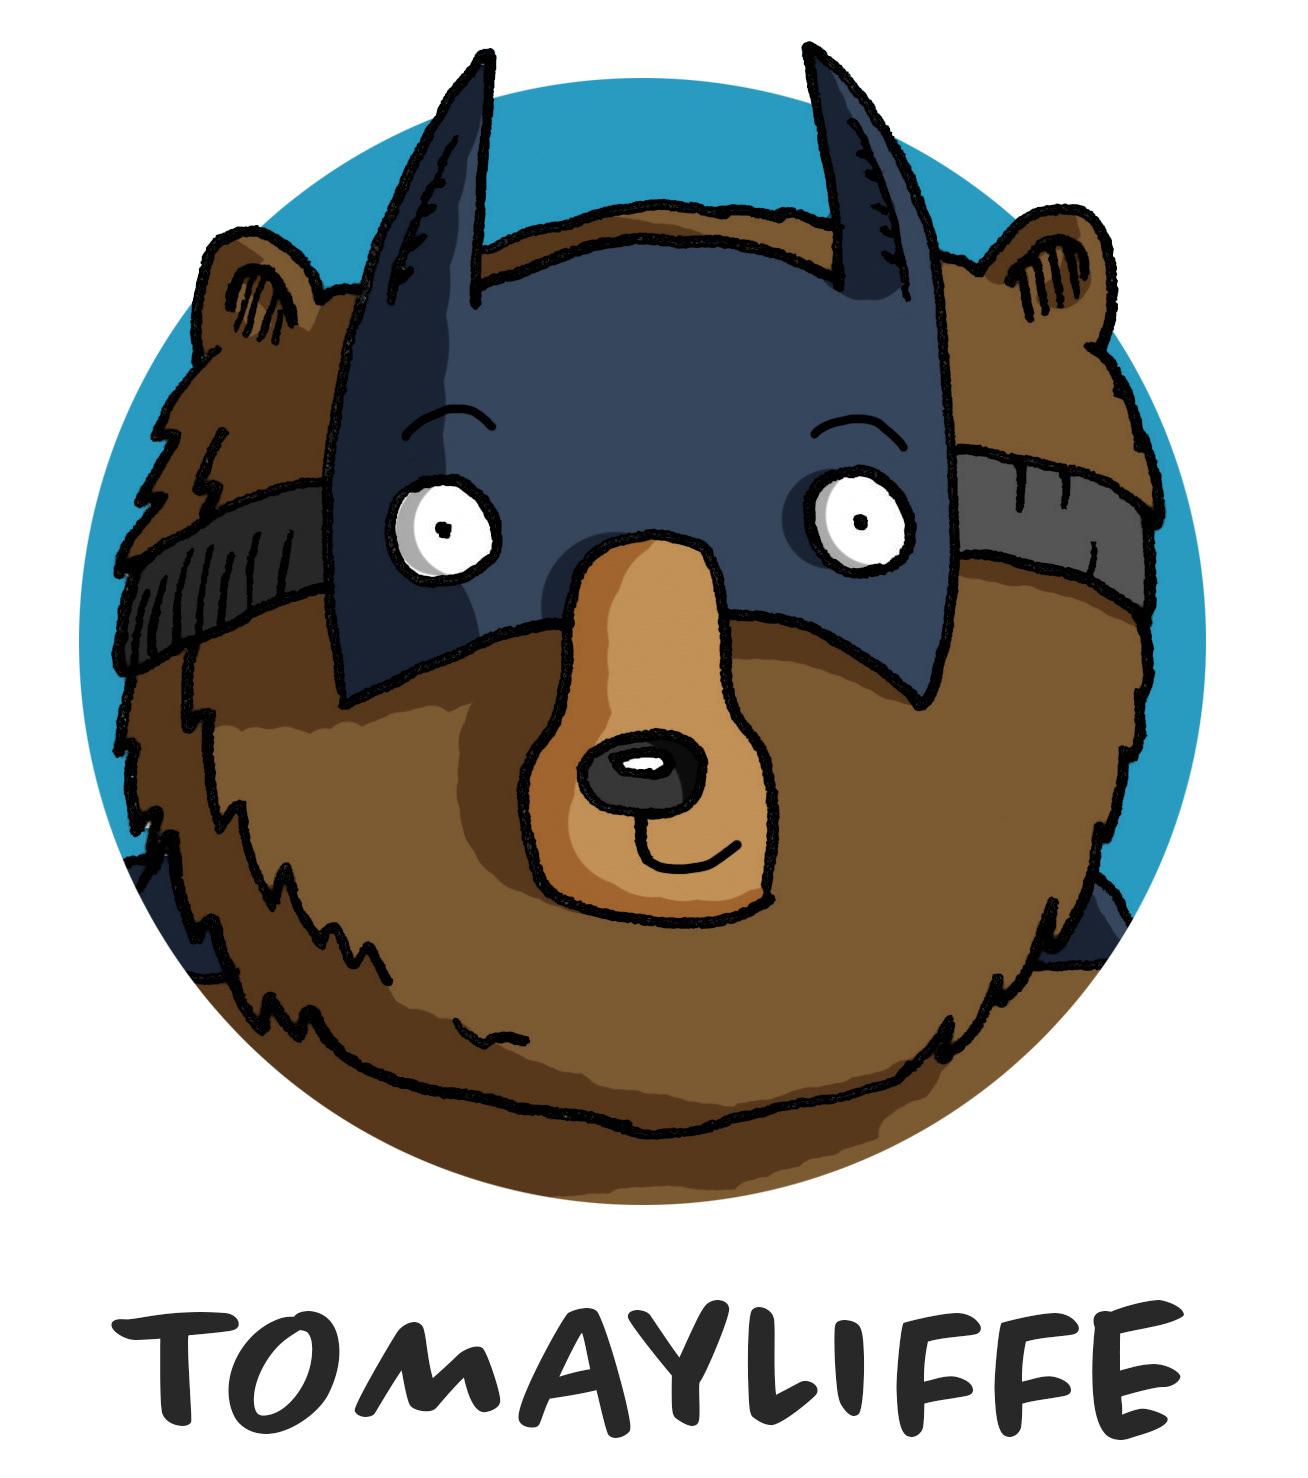 Tom Ayliffe